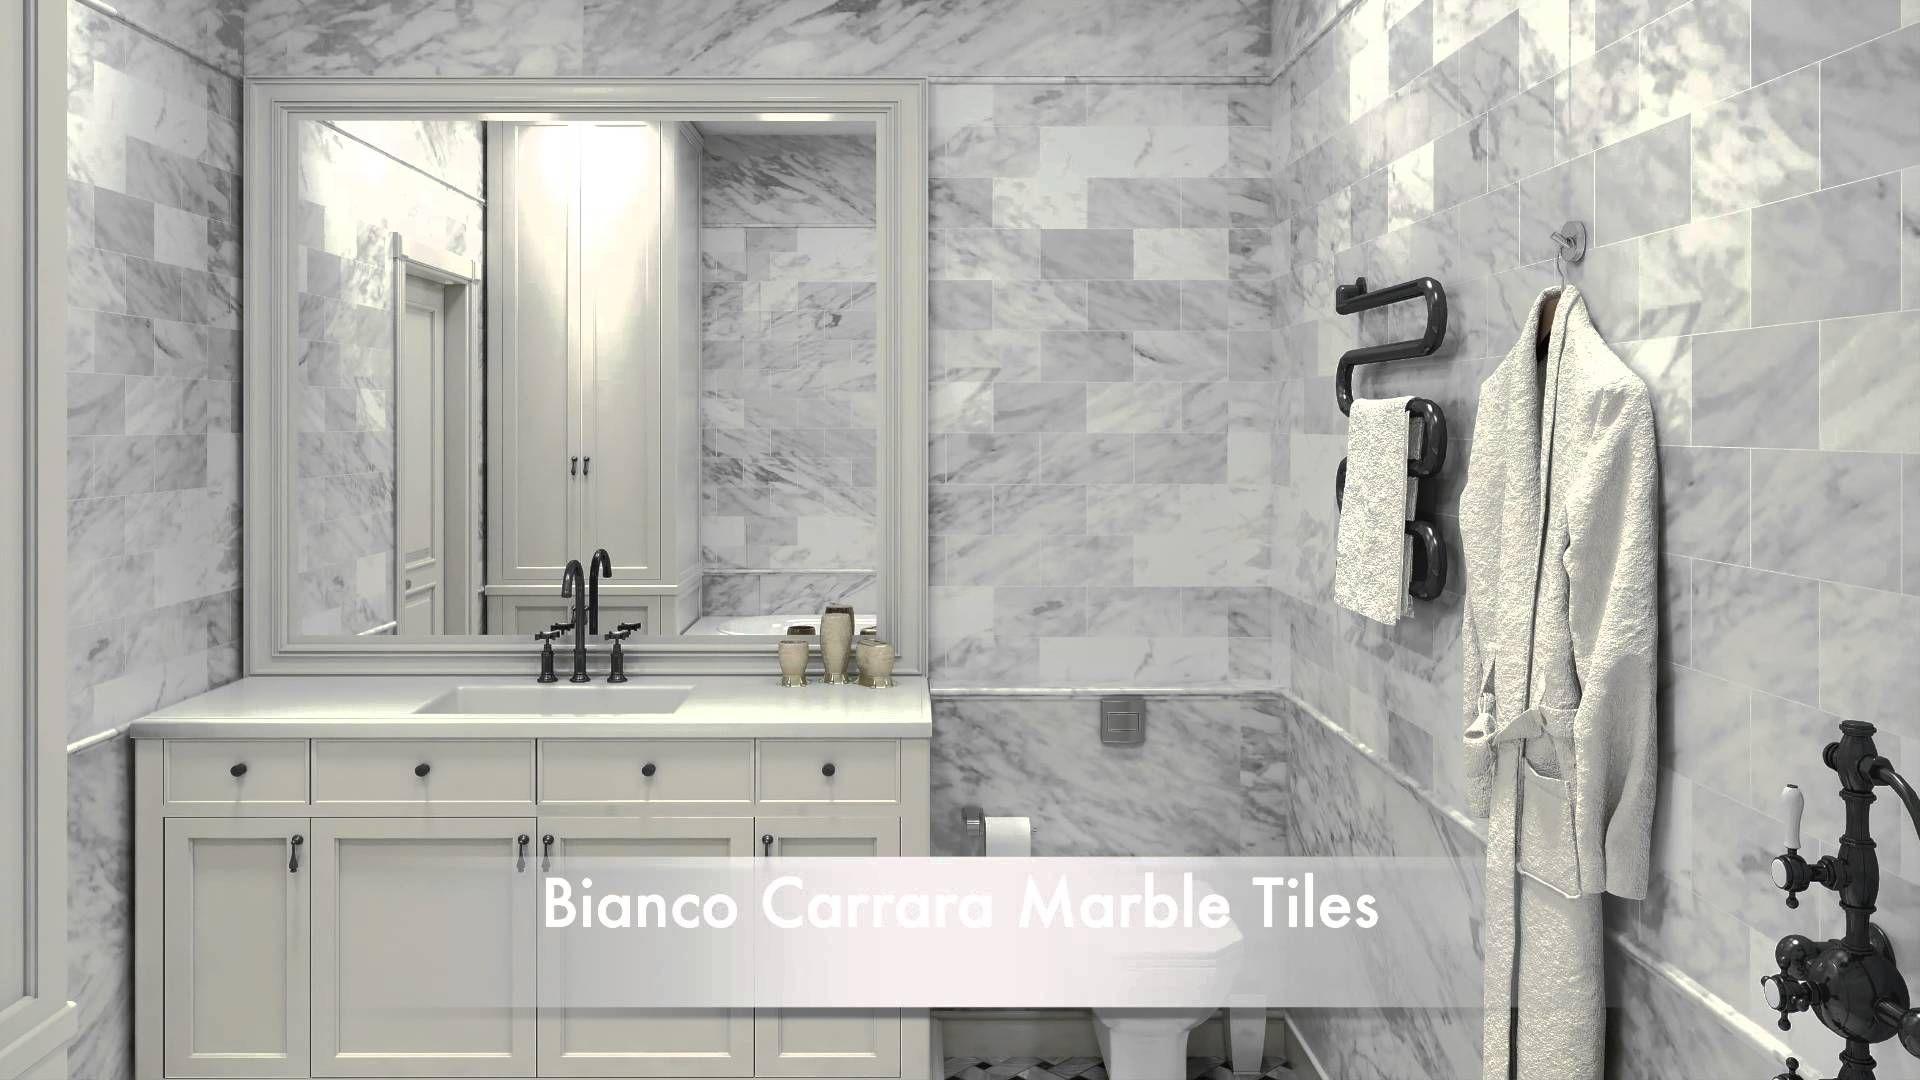 bathroom tile ideas white carrara marble tiles and calacatta gold rh pinterest com